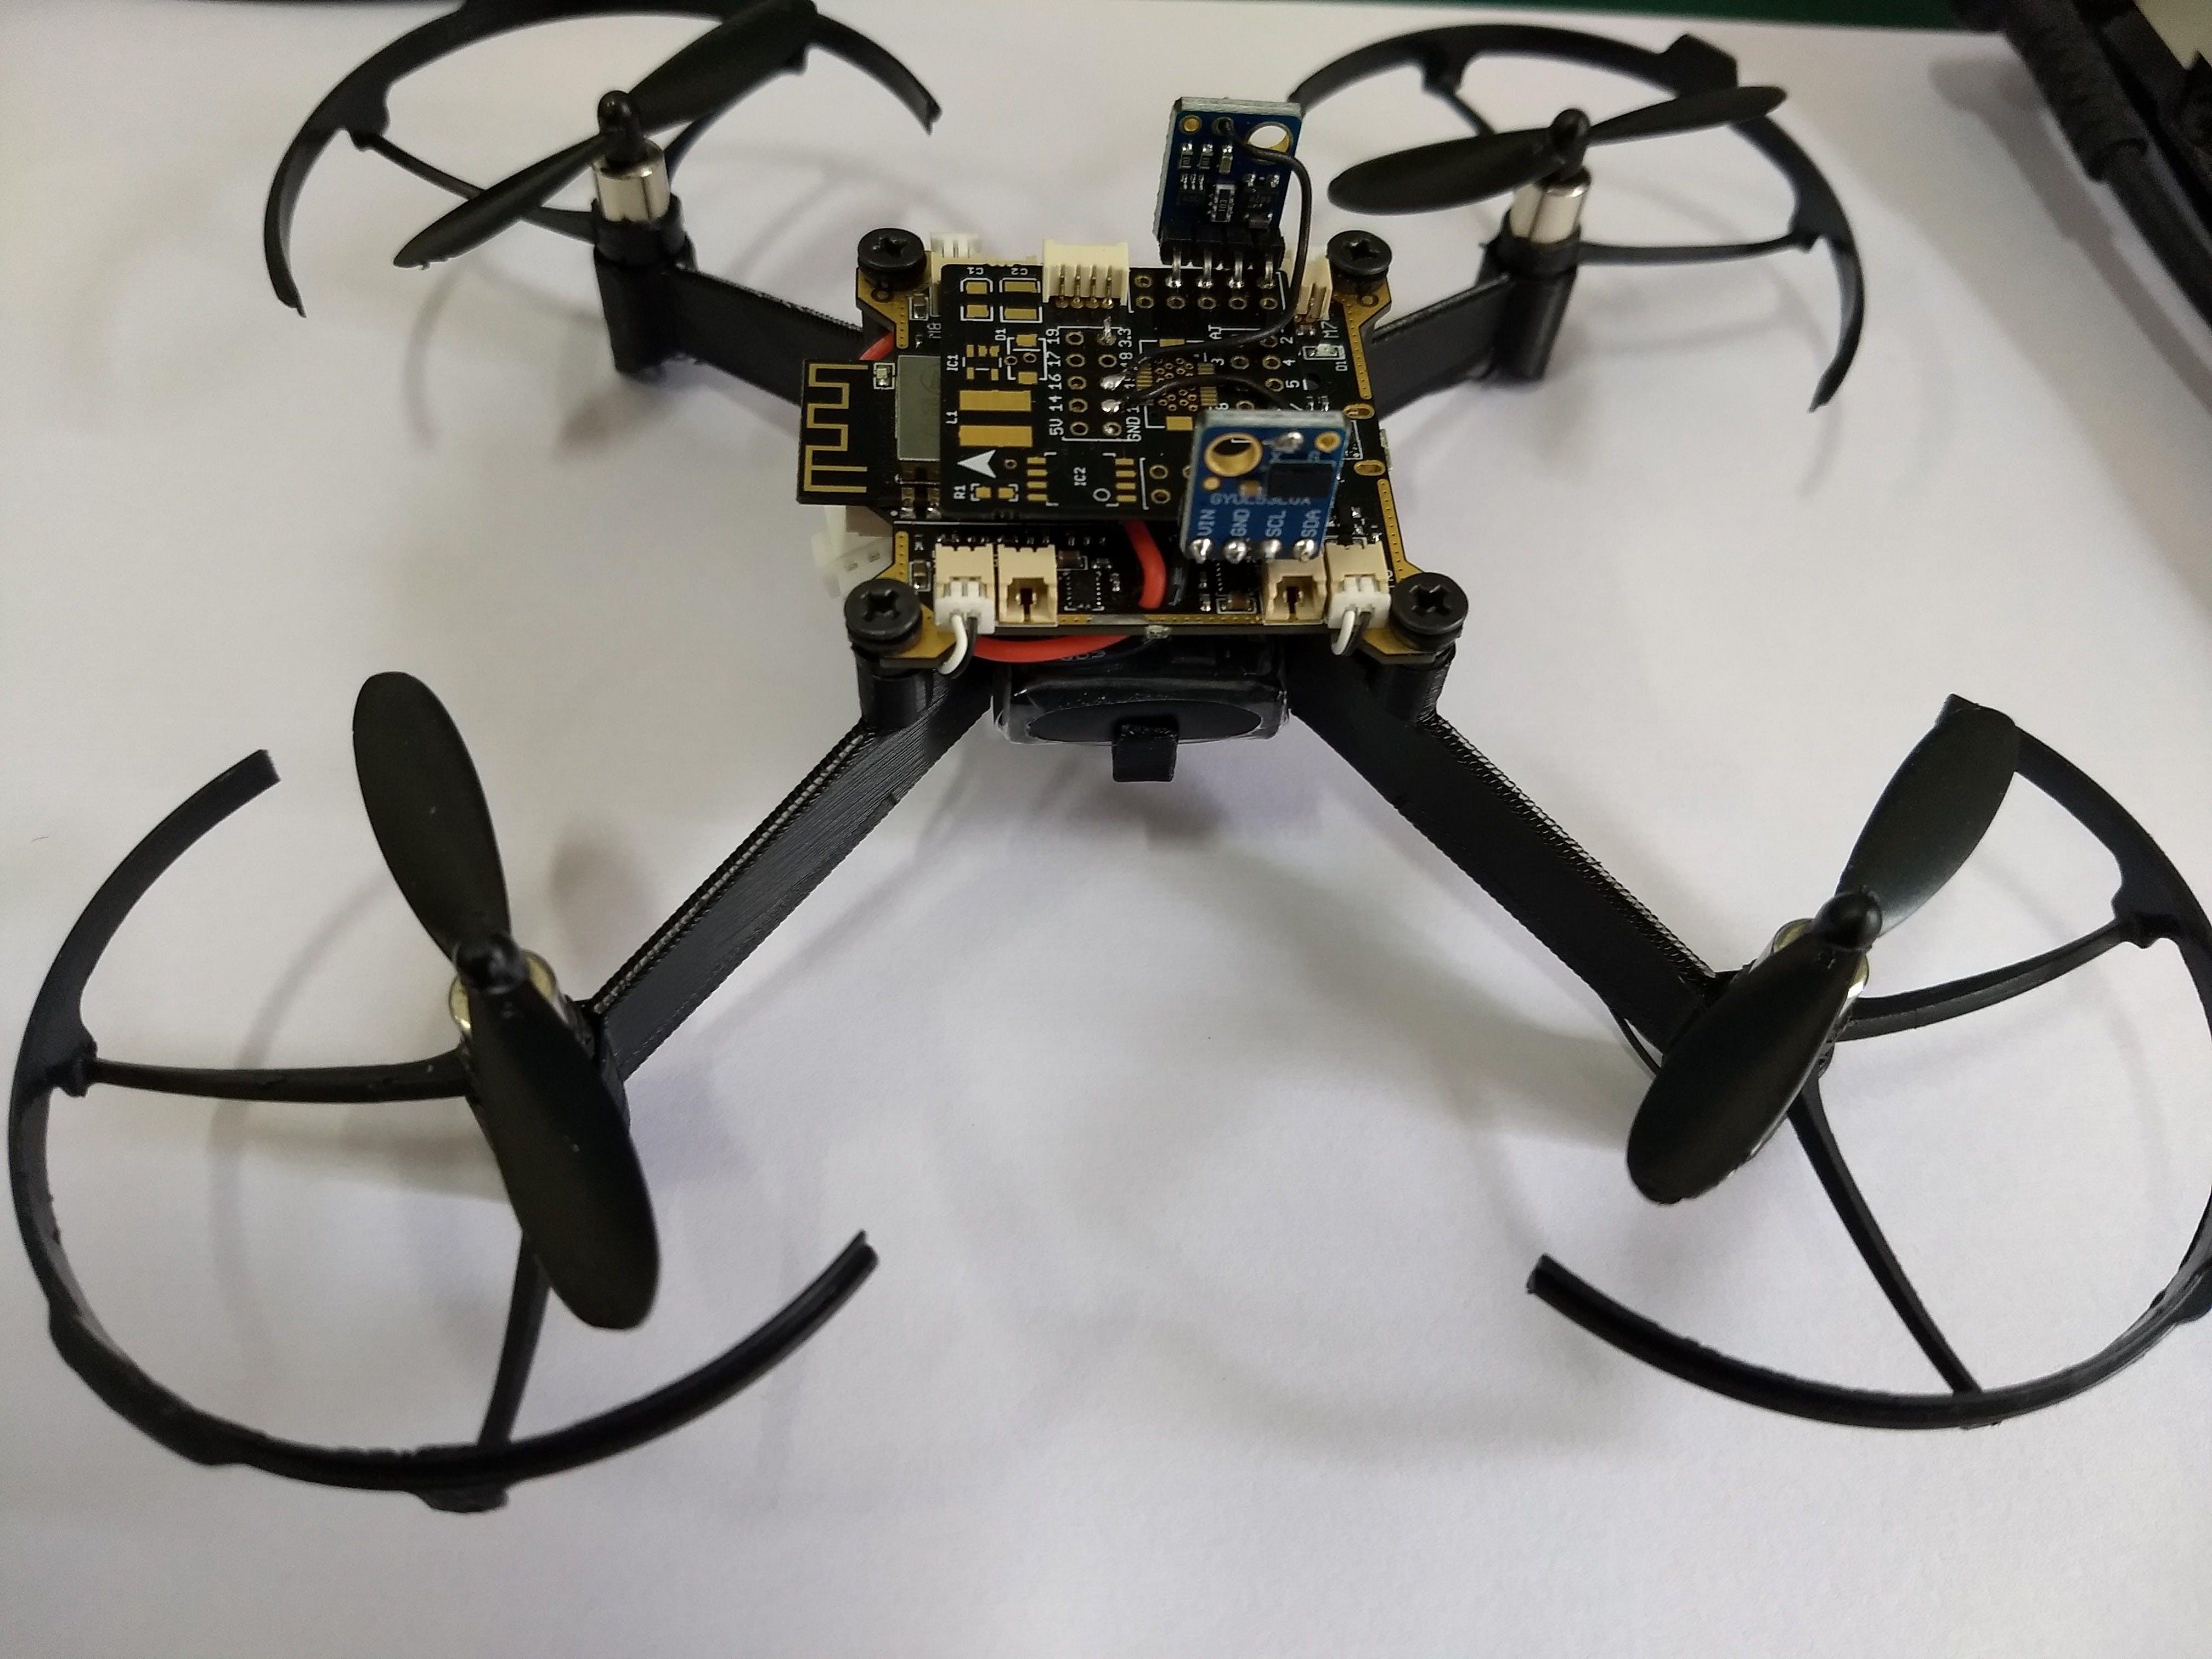 TableTennis Drone